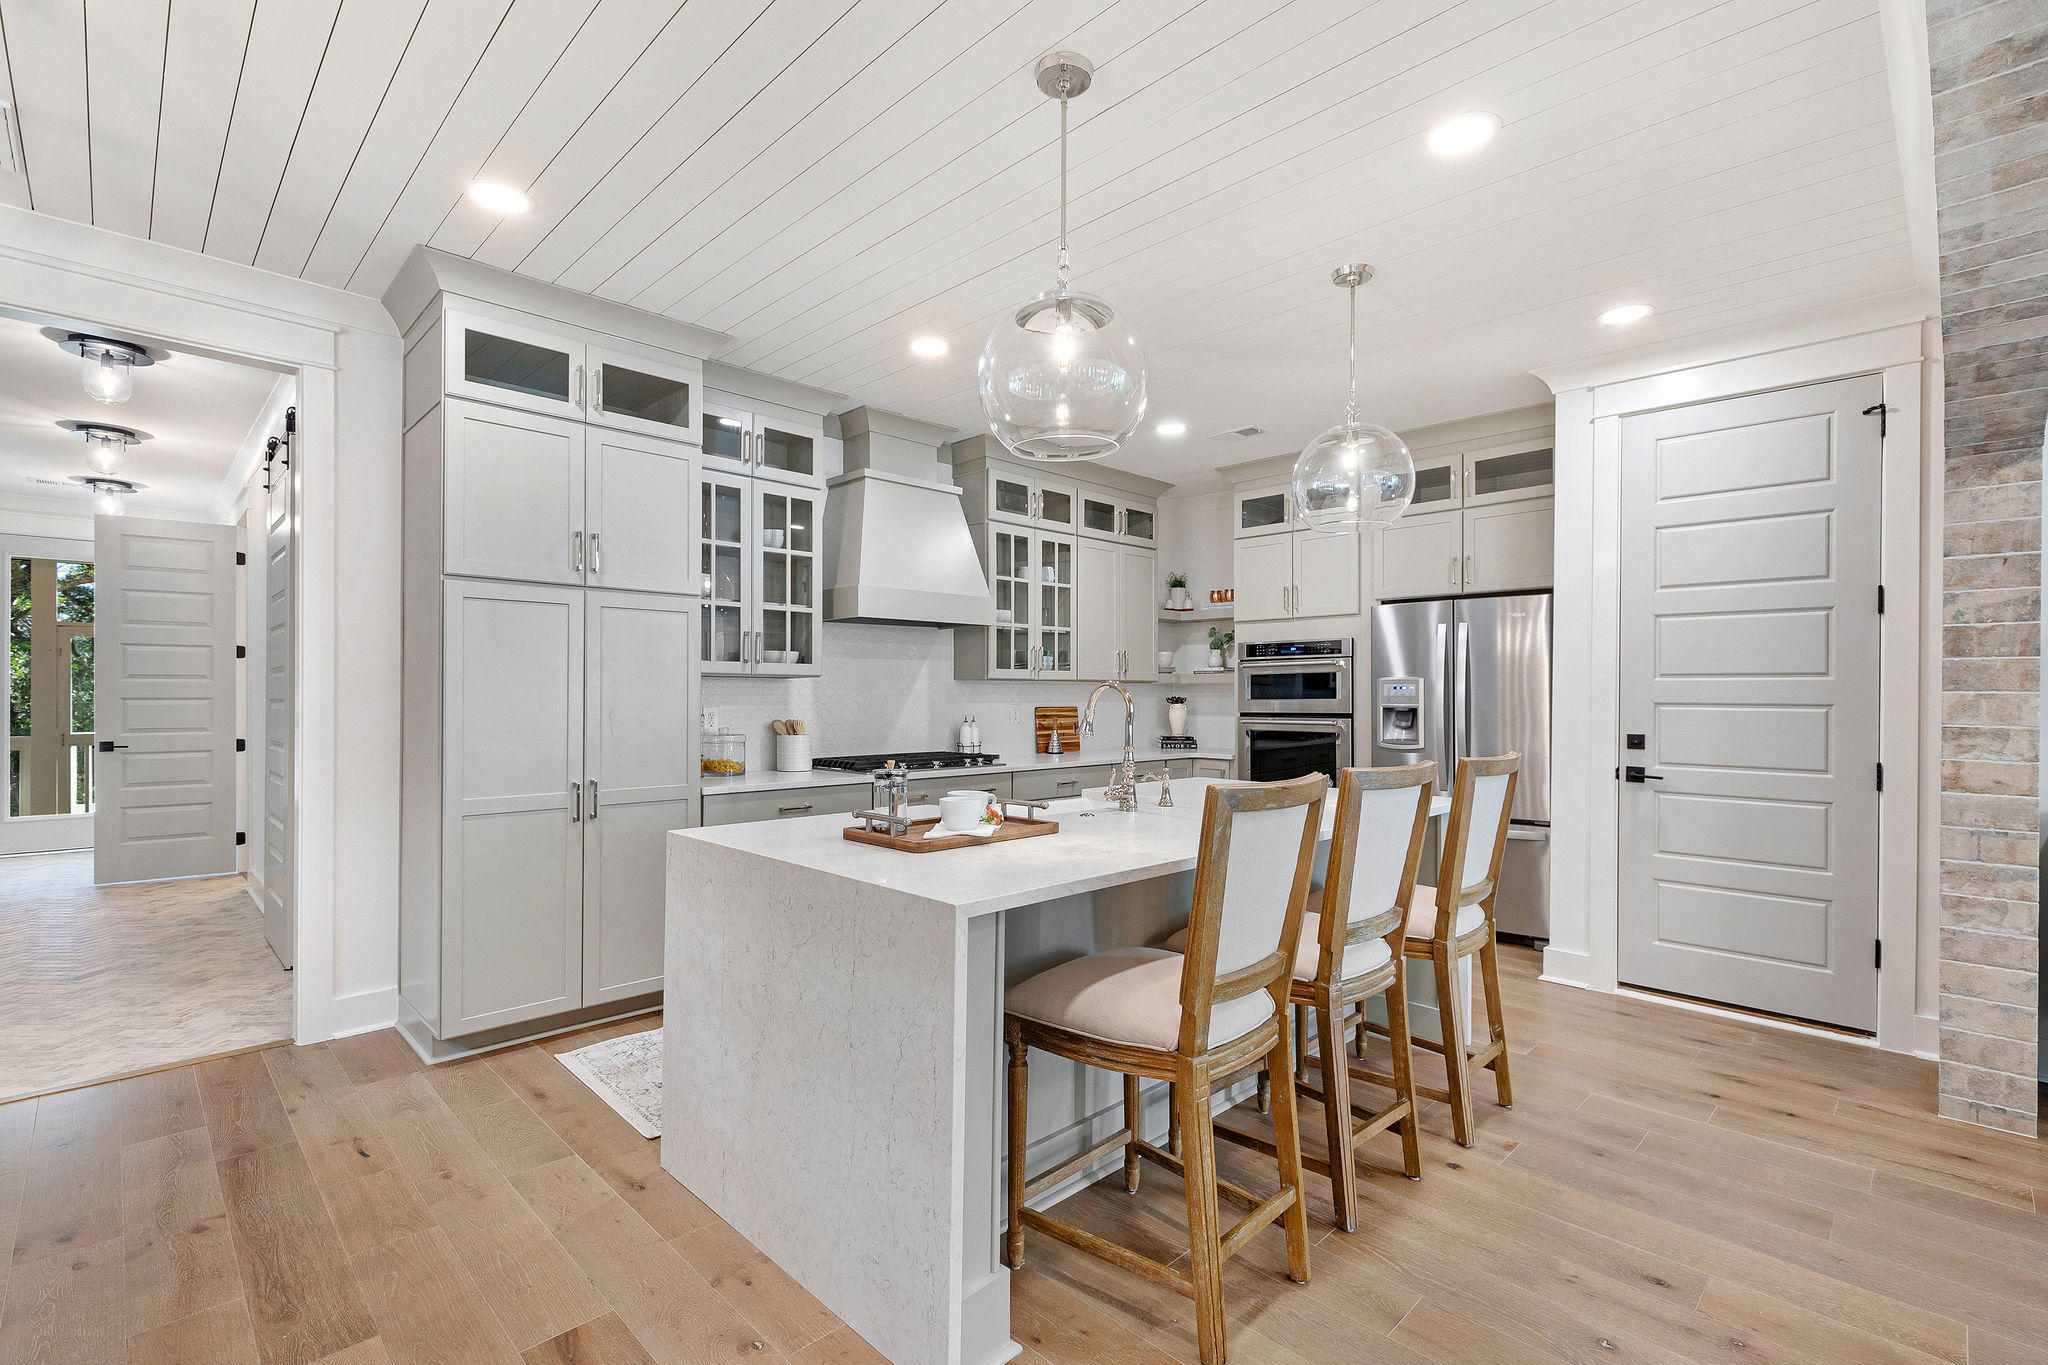 Avenue of Oaks Homes For Sale - 1027 Avenue Of Oaks, Charleston, SC - 38